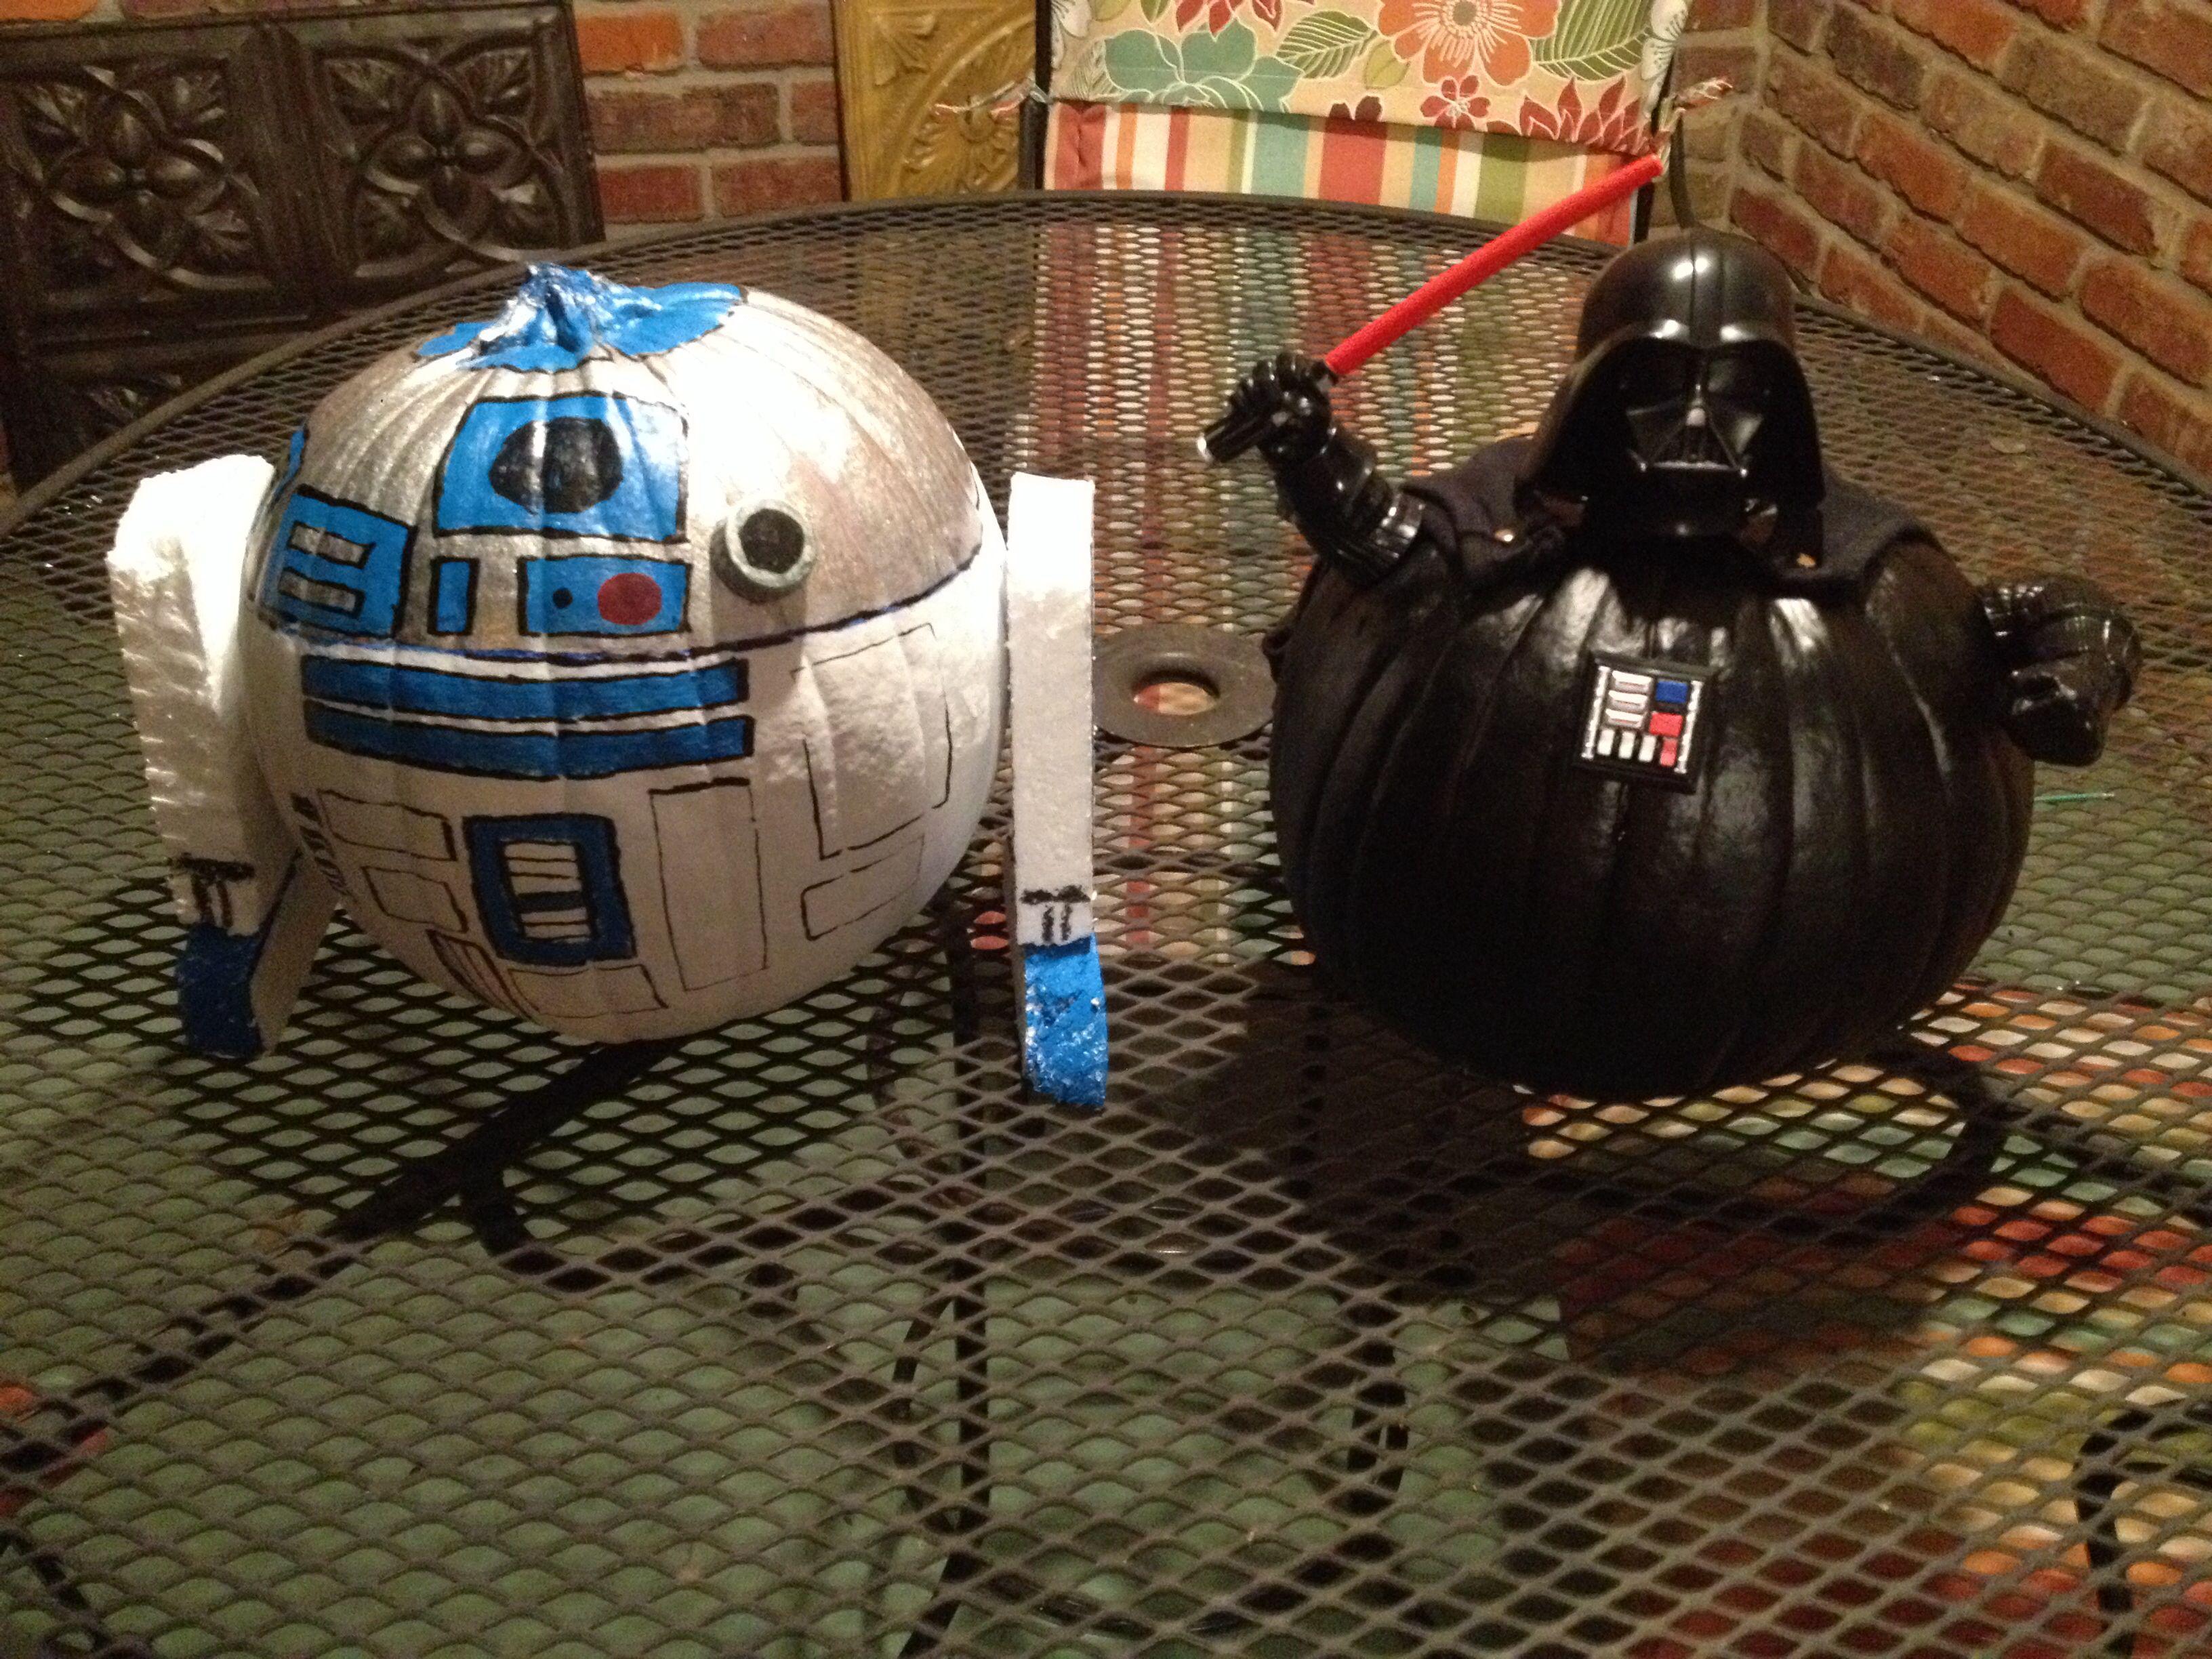 r2d2 and darth vader pumpkins halloween stuff halloween decorations halloween pumpkins. Black Bedroom Furniture Sets. Home Design Ideas